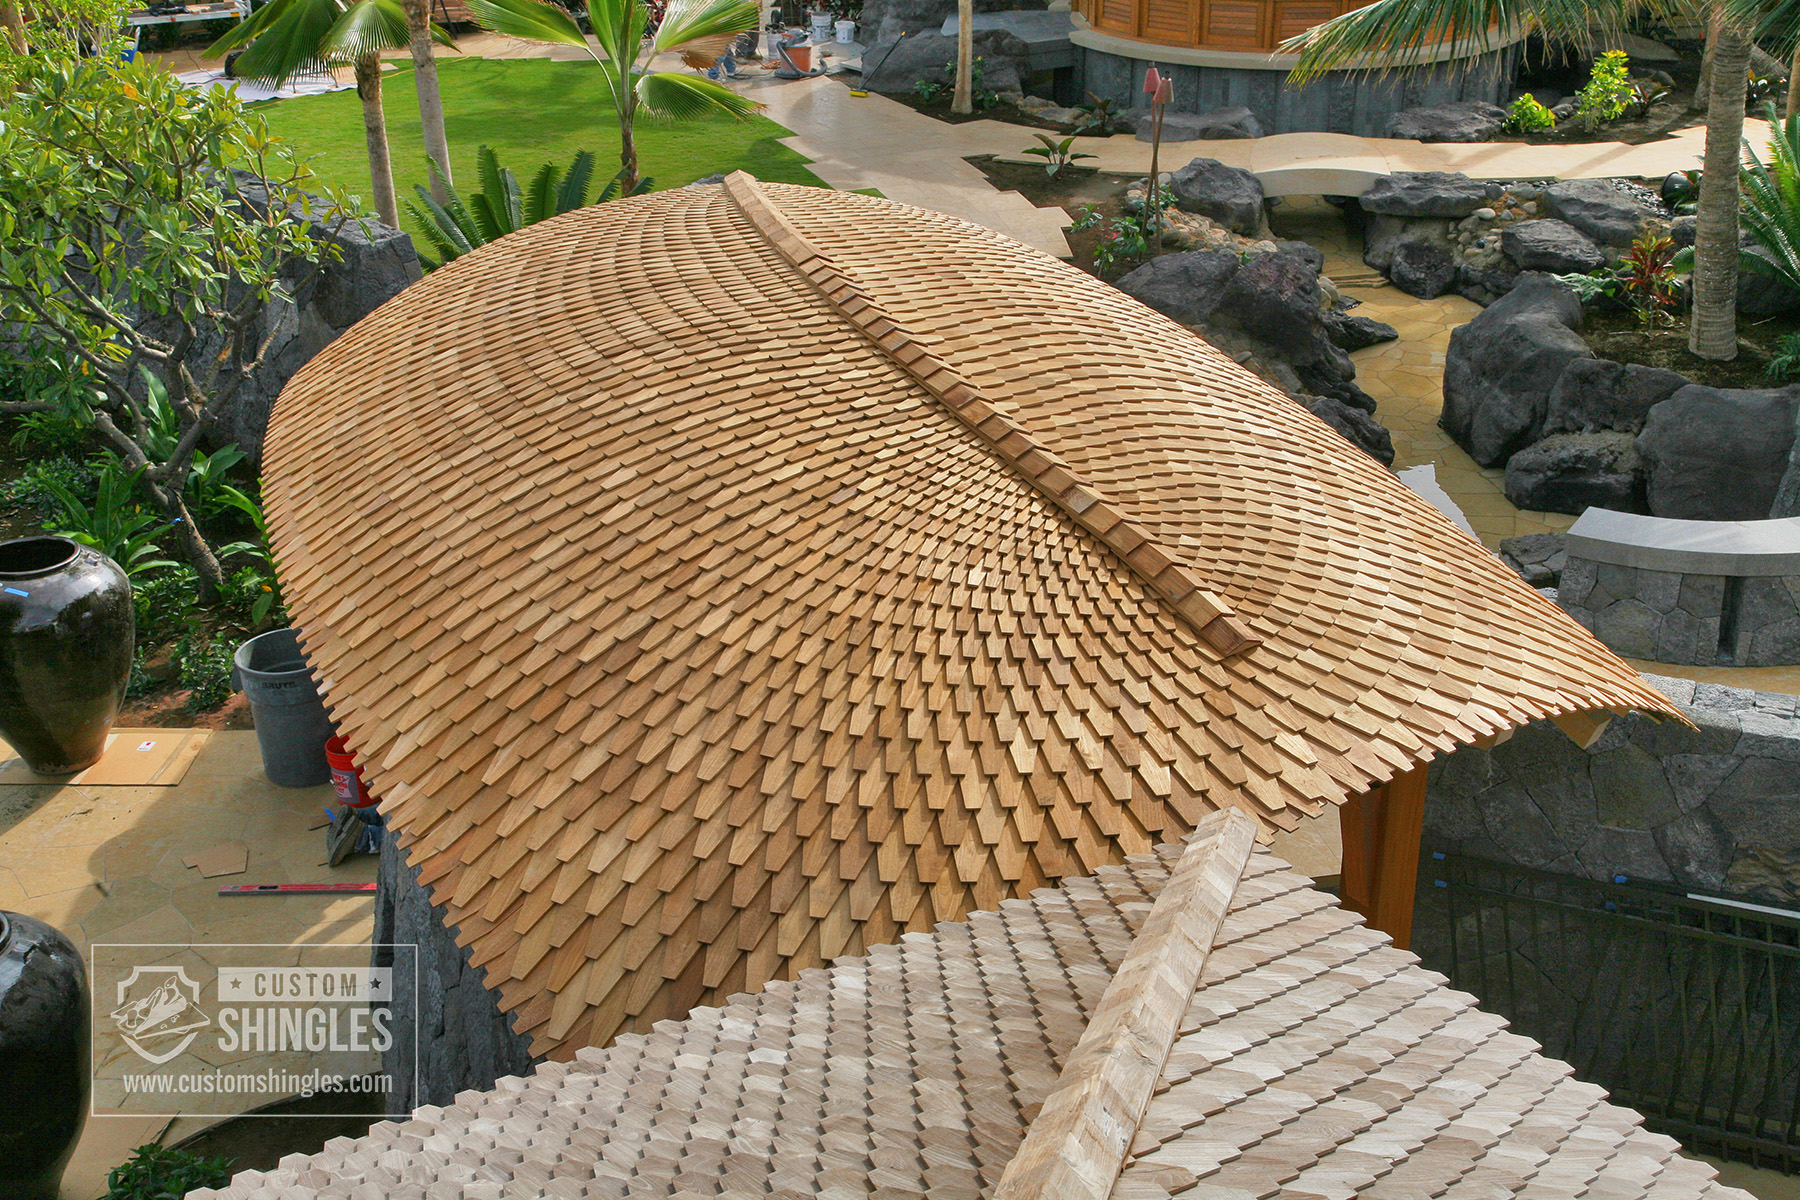 Kona,-Hawaii-Residence-with-Onsite-Steam-Bent-Teak-Shingles-(4) copy.jpg